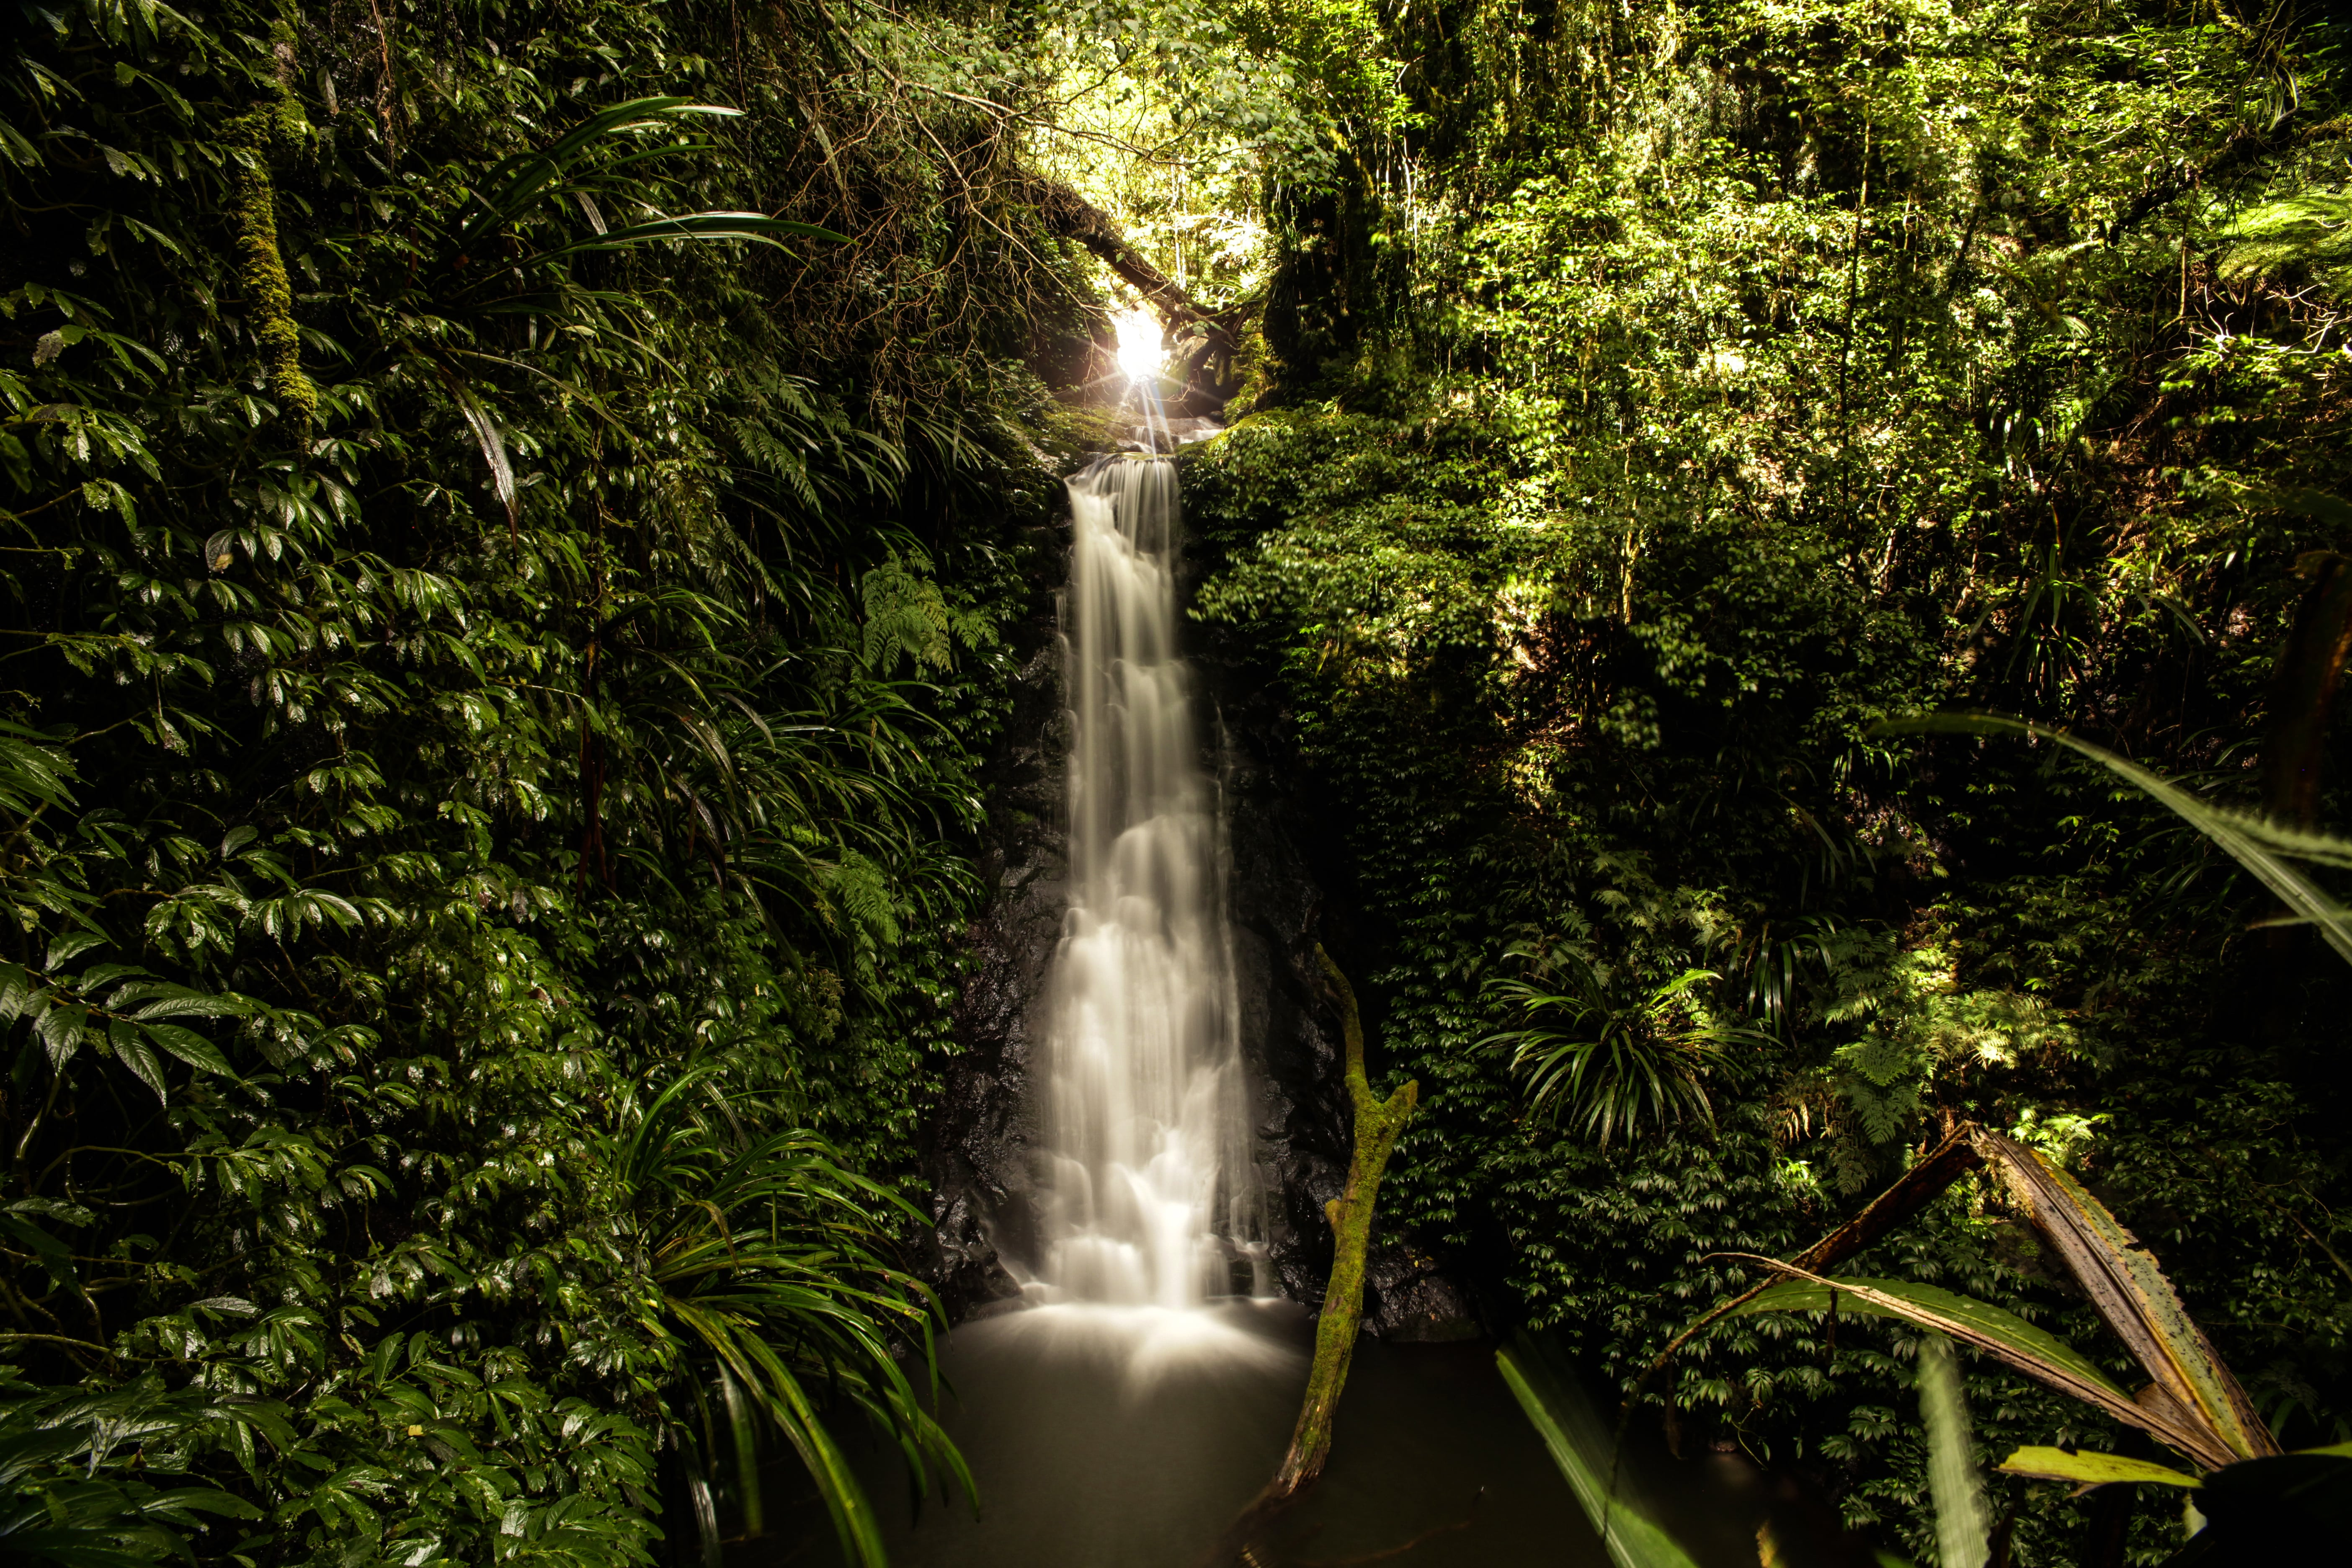 Gwongurai Falls Tooloona Circuit Hiking Nowhere & Everywhere Gold Coast Hinterland Brisbane Lis Dingjan Photography Queensland #thisisqueensland Springbrook O'Reilly's Lamington National Parks